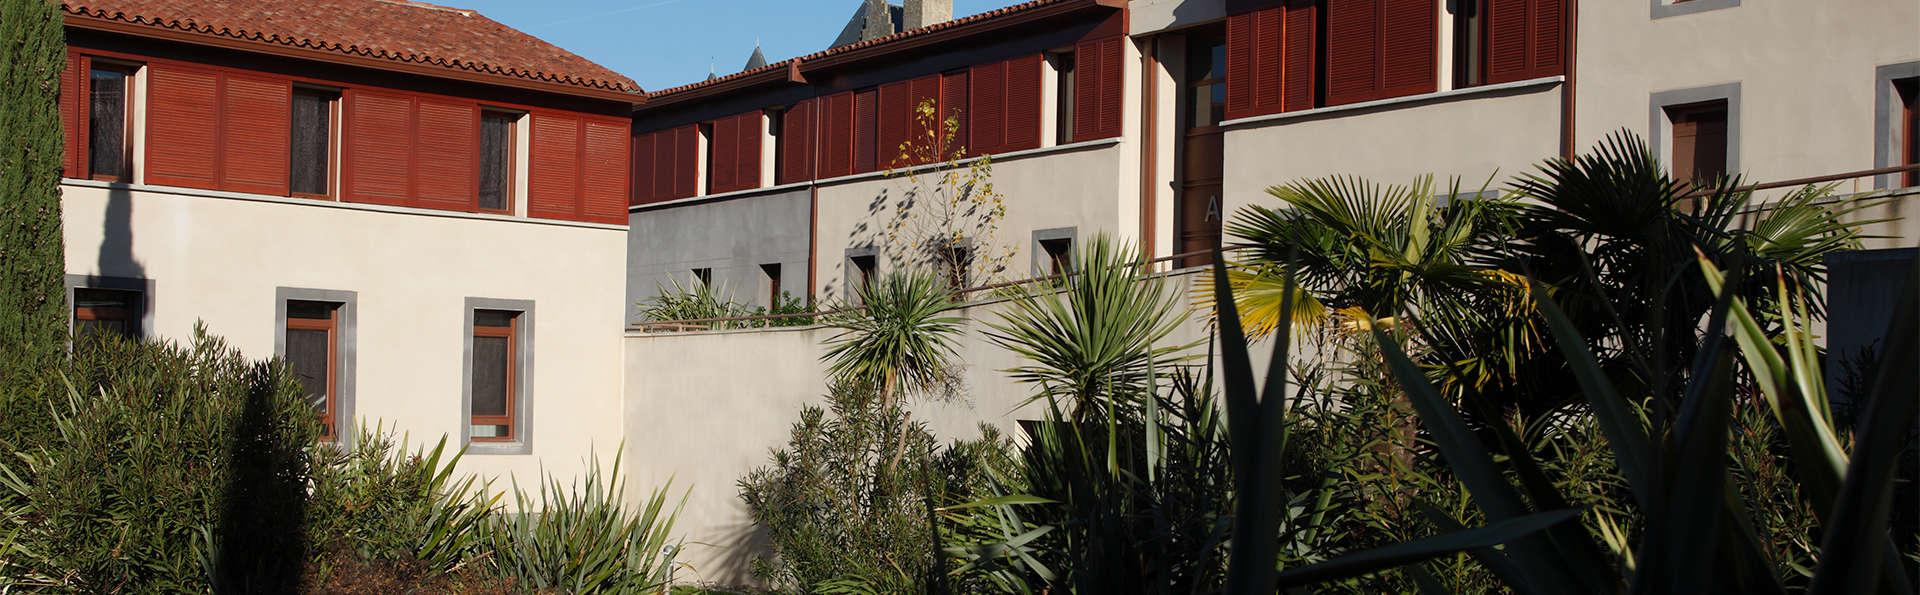 Adonis Carcassonne - La Barbacane - EDIT_Exterior1.jpg